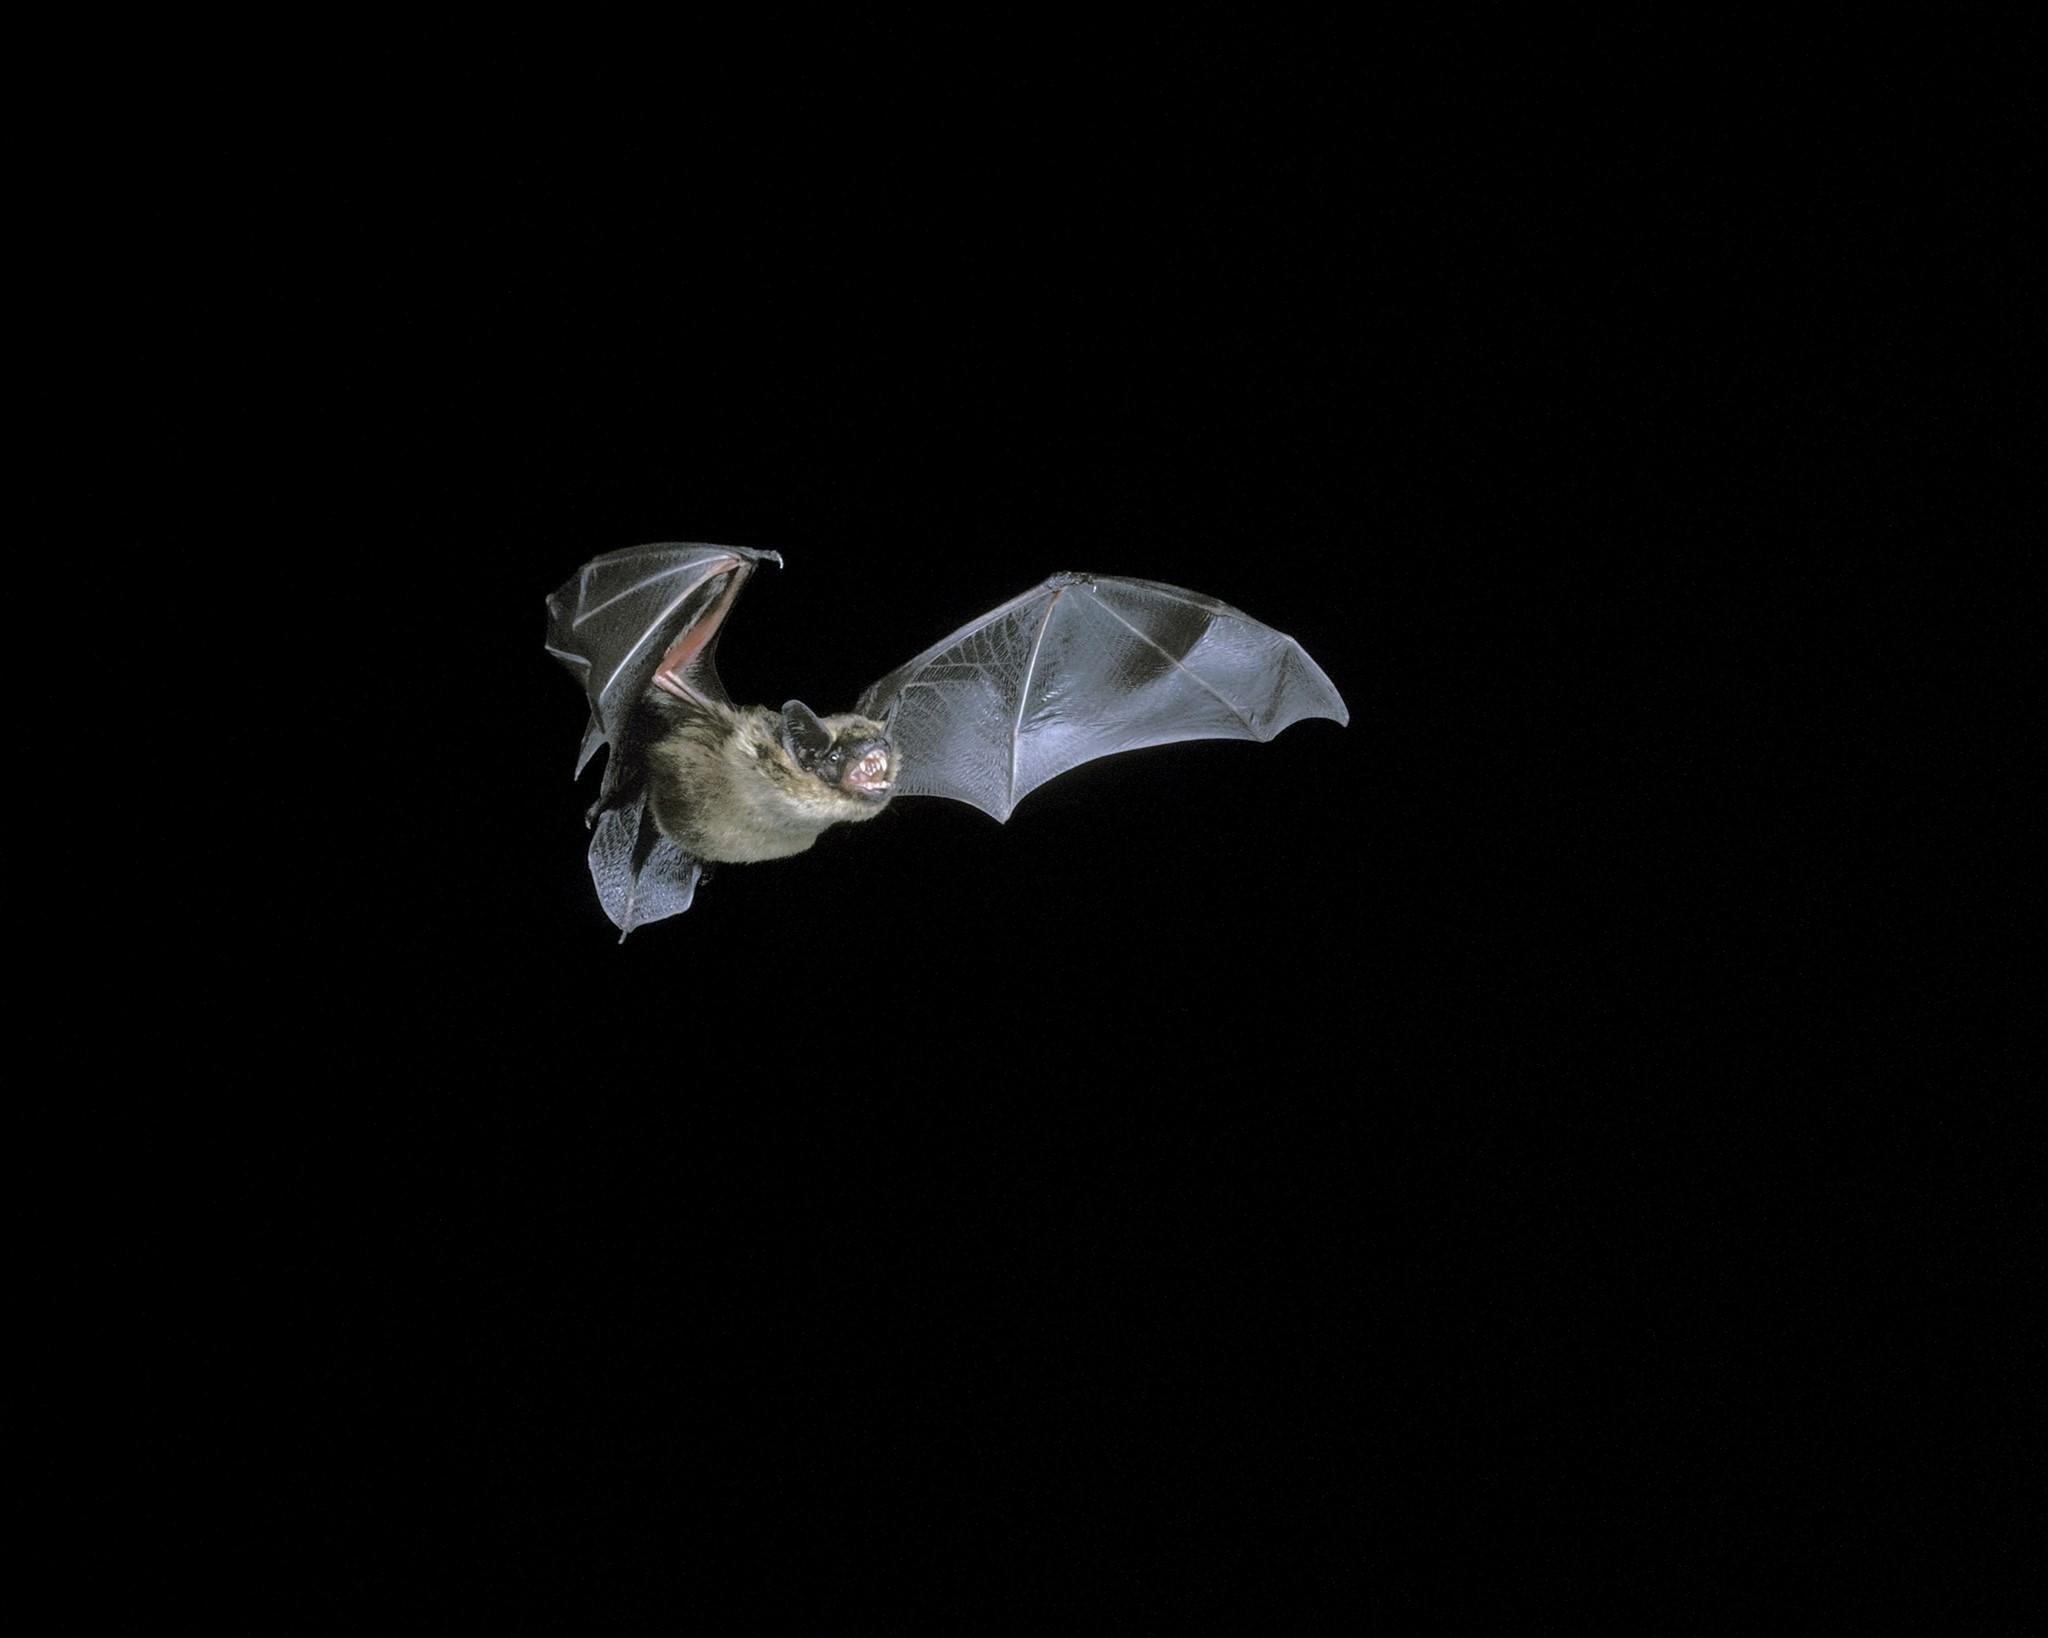 Halloween Crafts 'Make Your Own Bat Box'